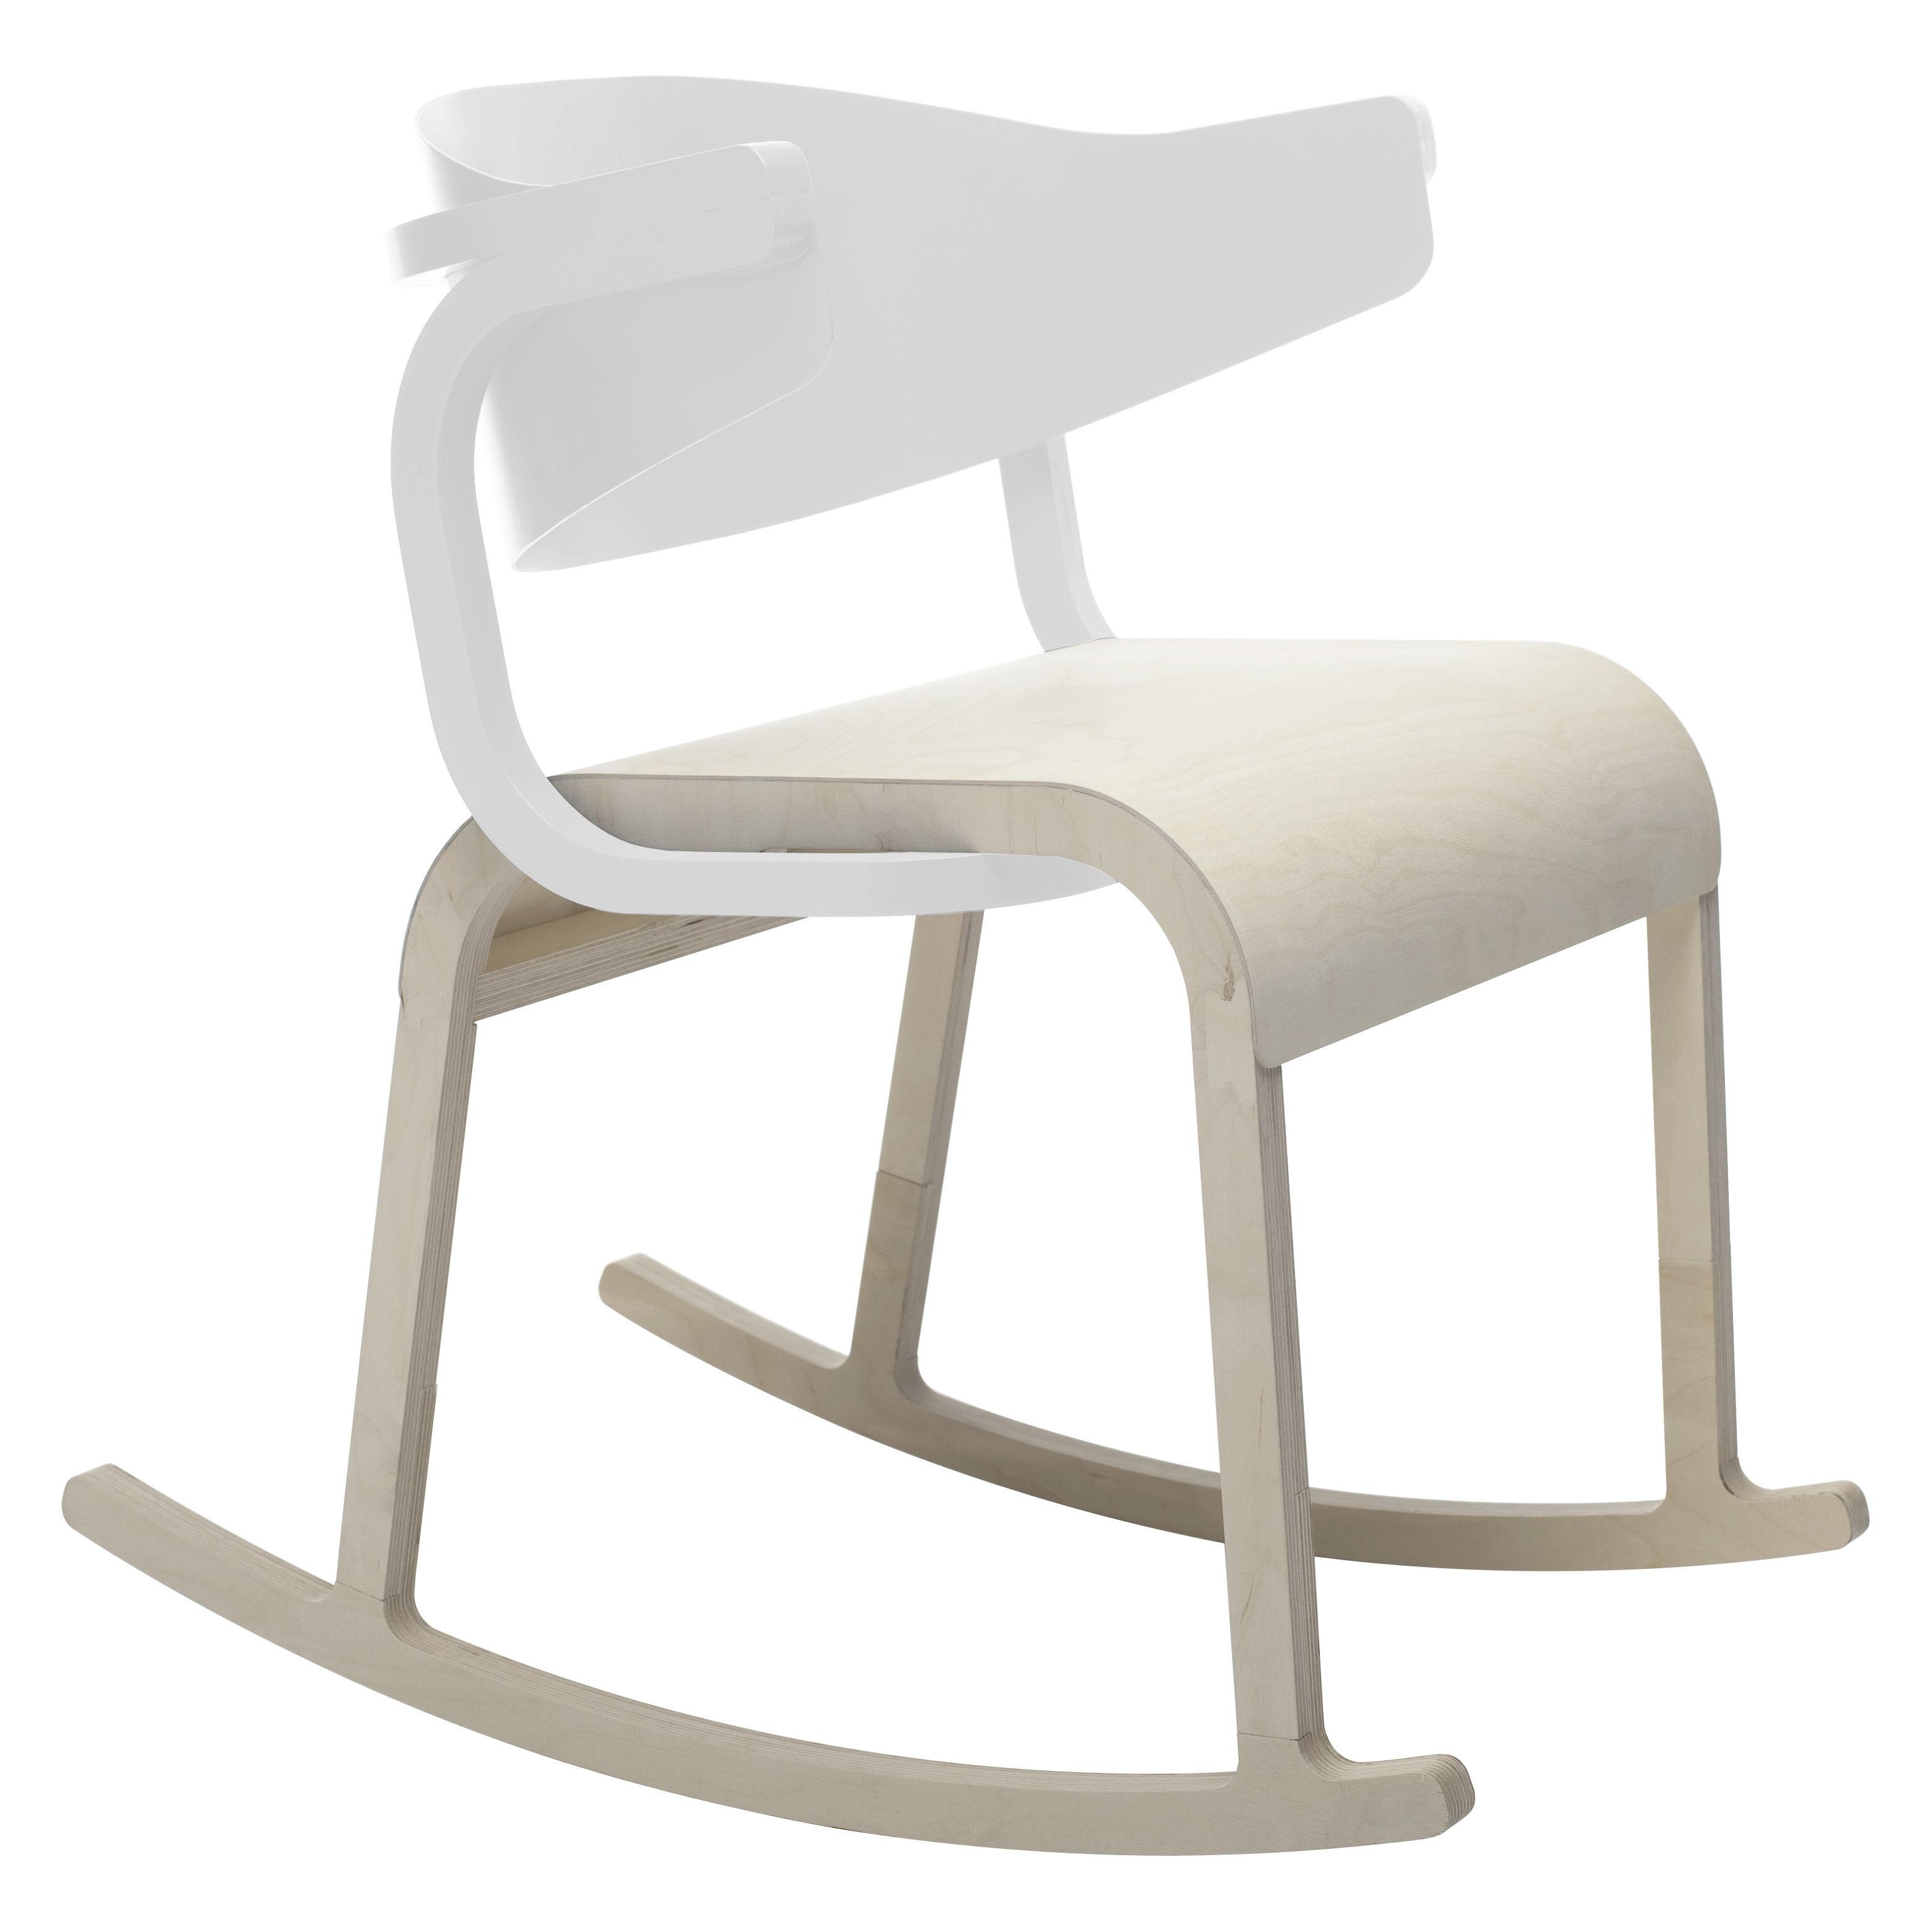 rocking chair perch blanc sp cimen editions. Black Bedroom Furniture Sets. Home Design Ideas